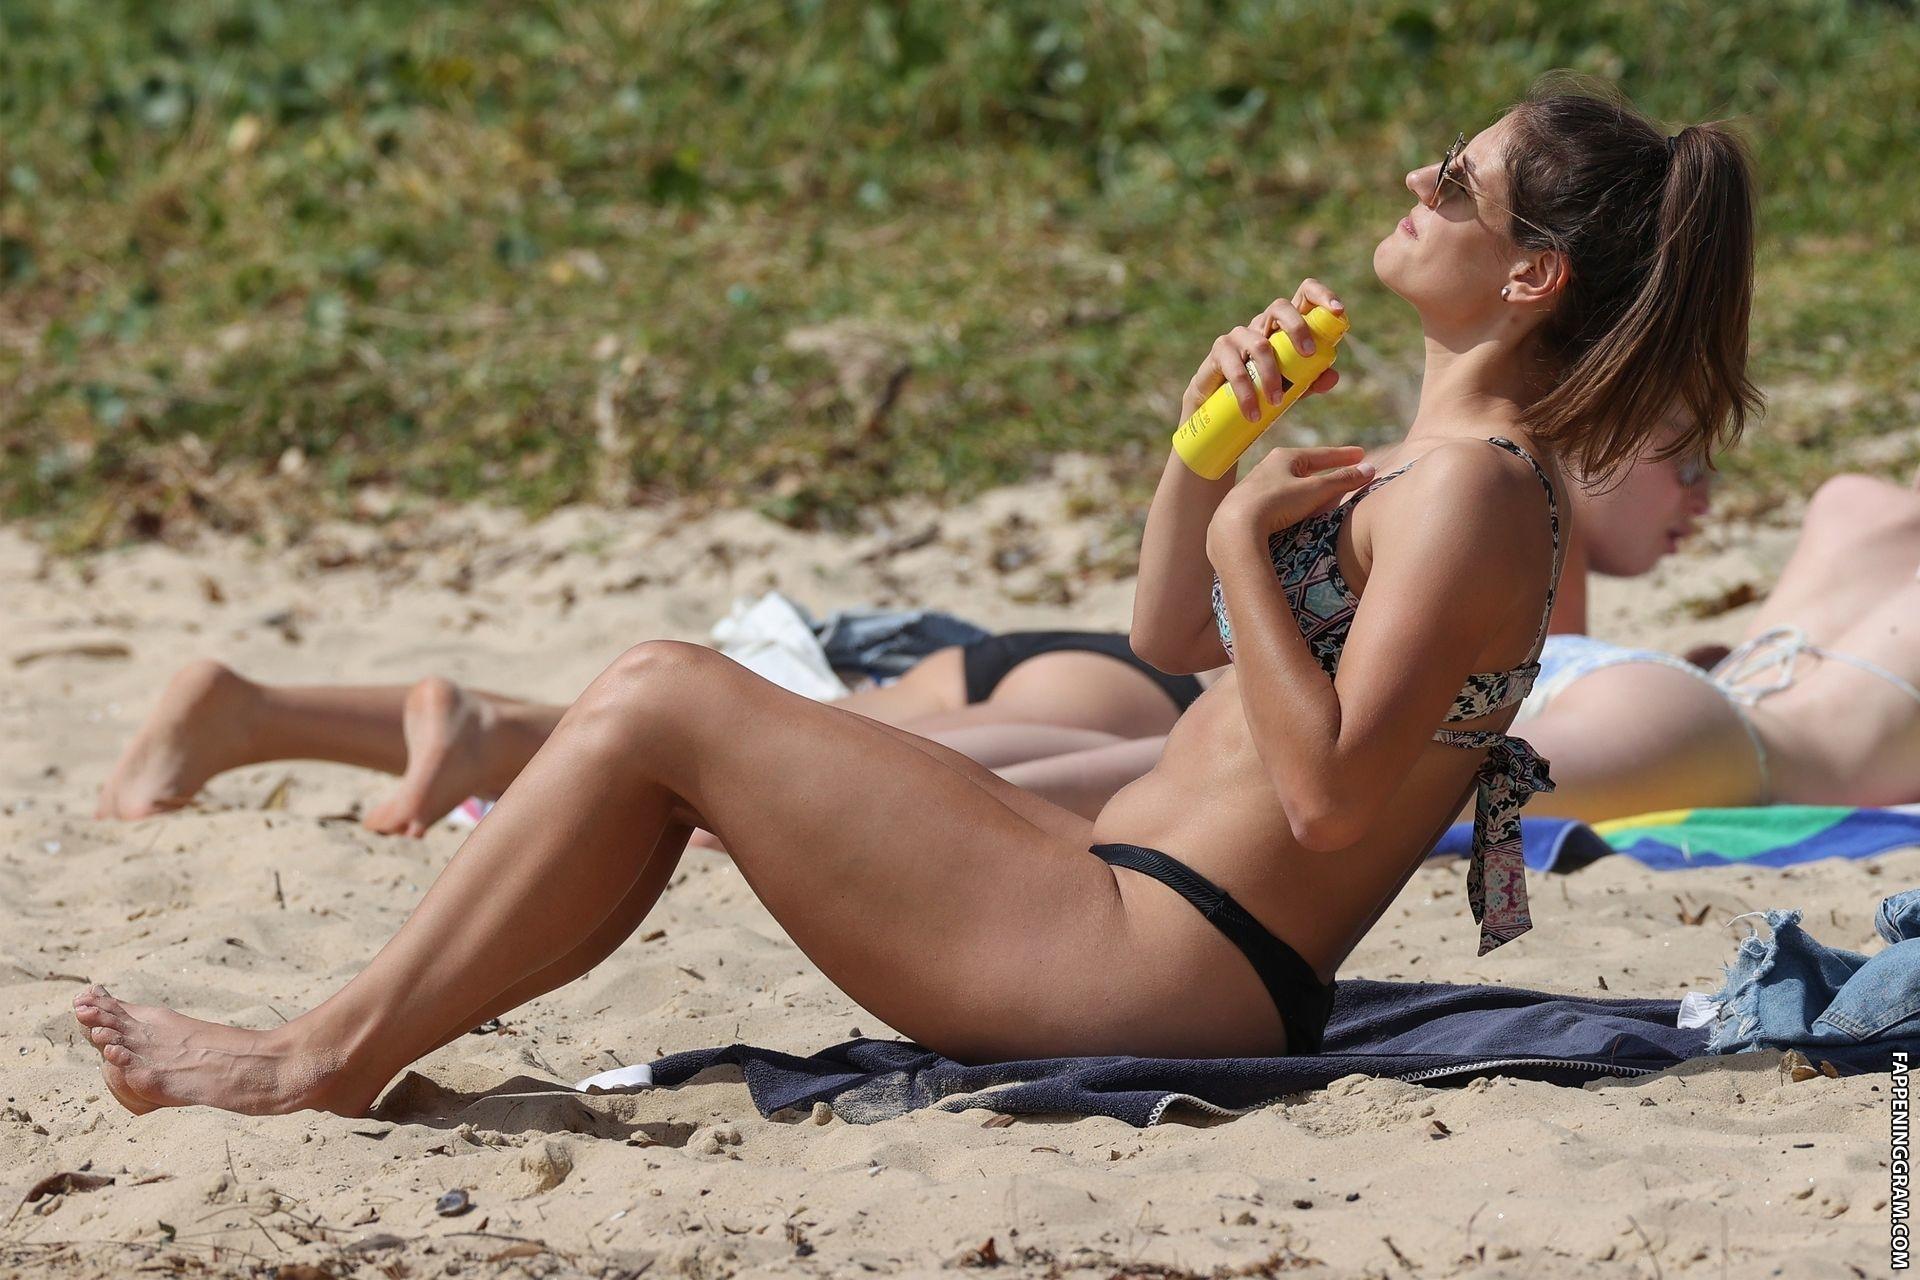 Marina Ivanovic Nude